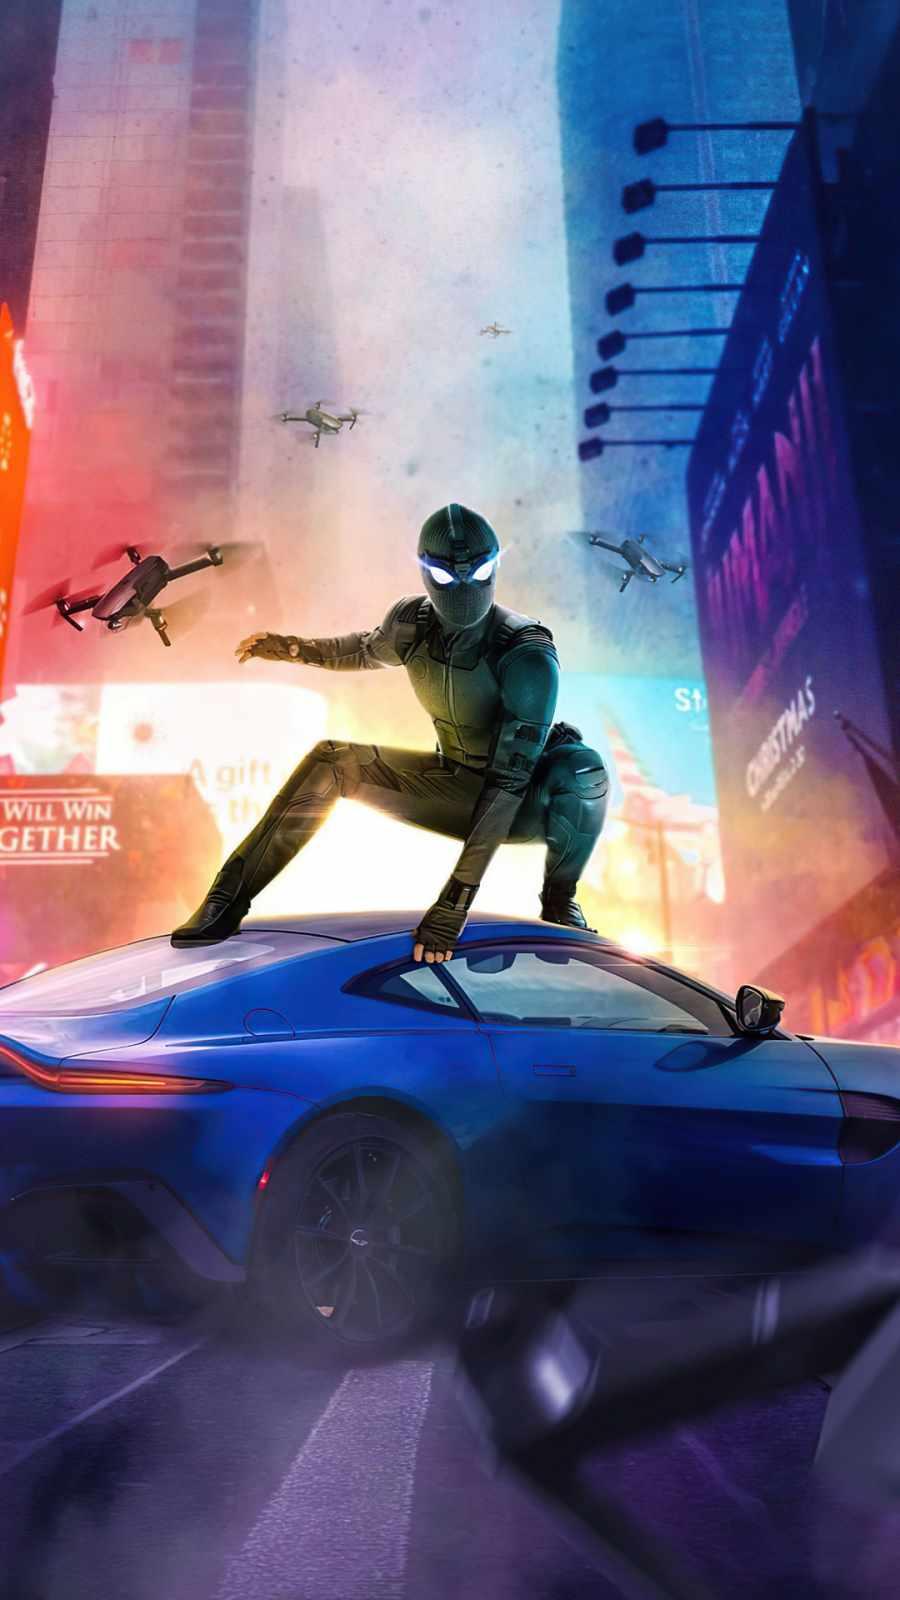 Chasing Spiderman